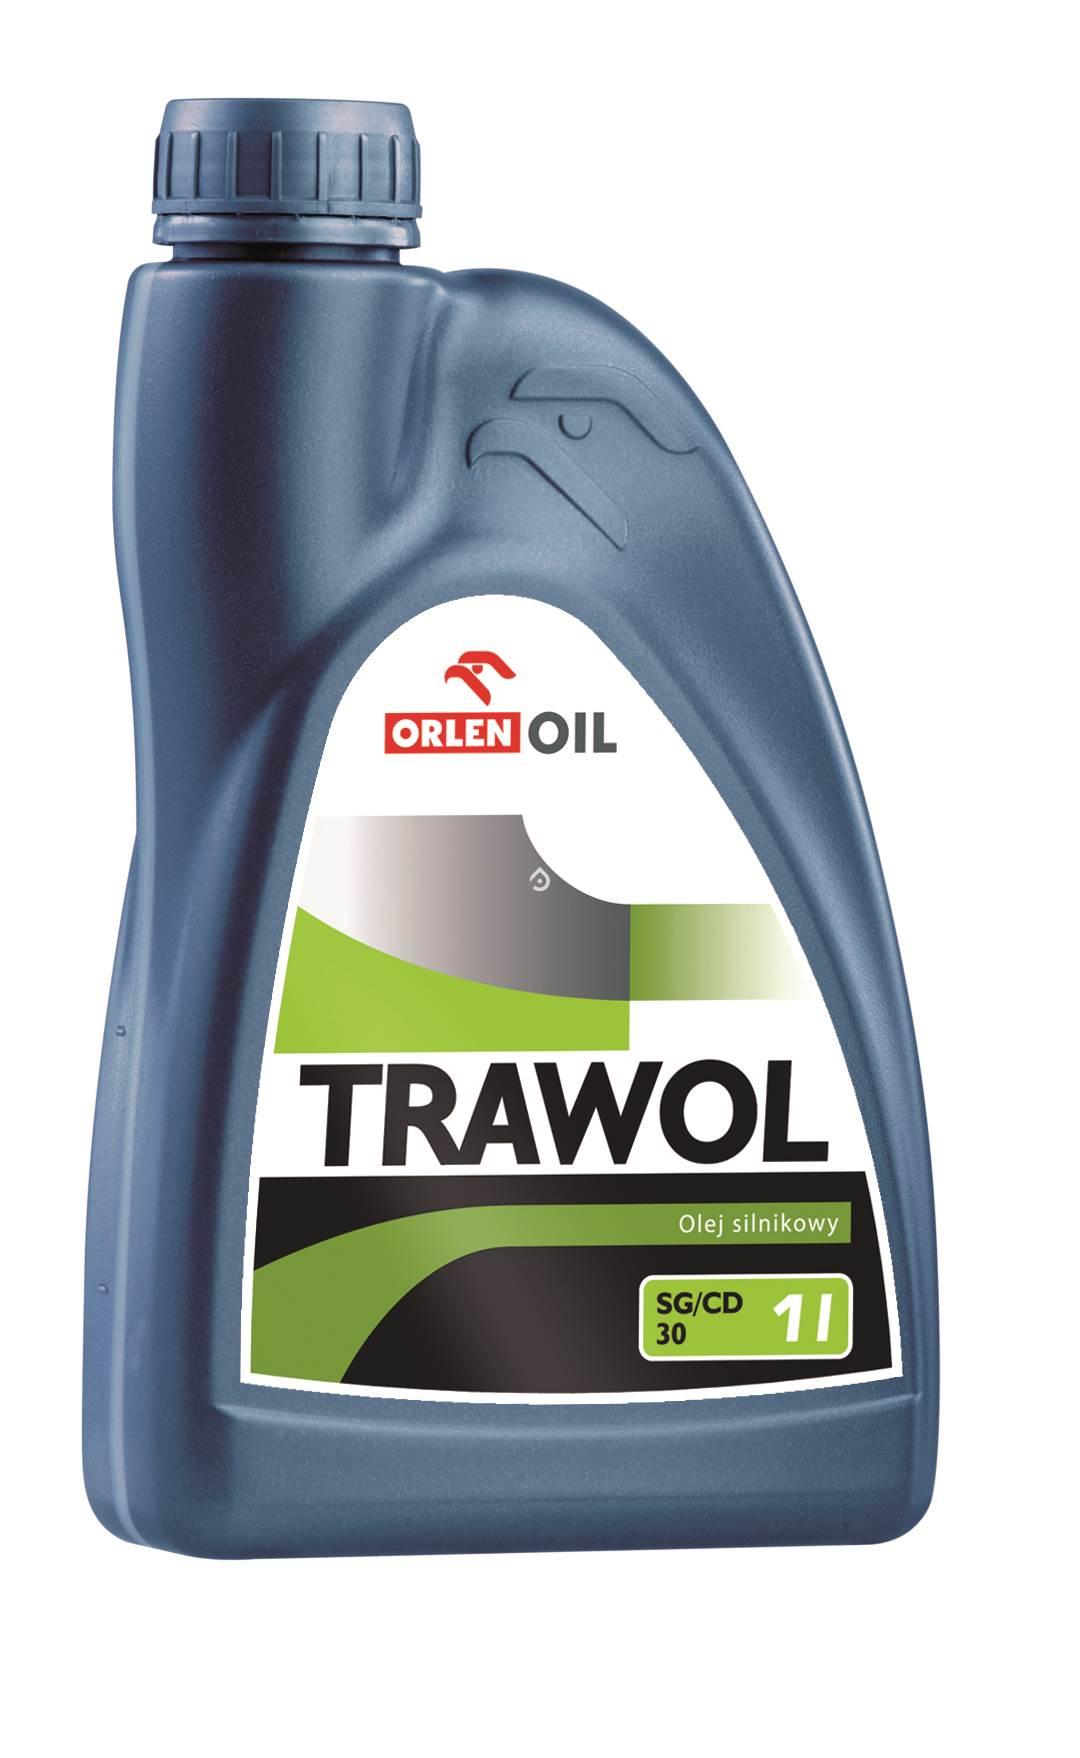 ORLEN OIL TRAWOL SG/CD 30 1L.